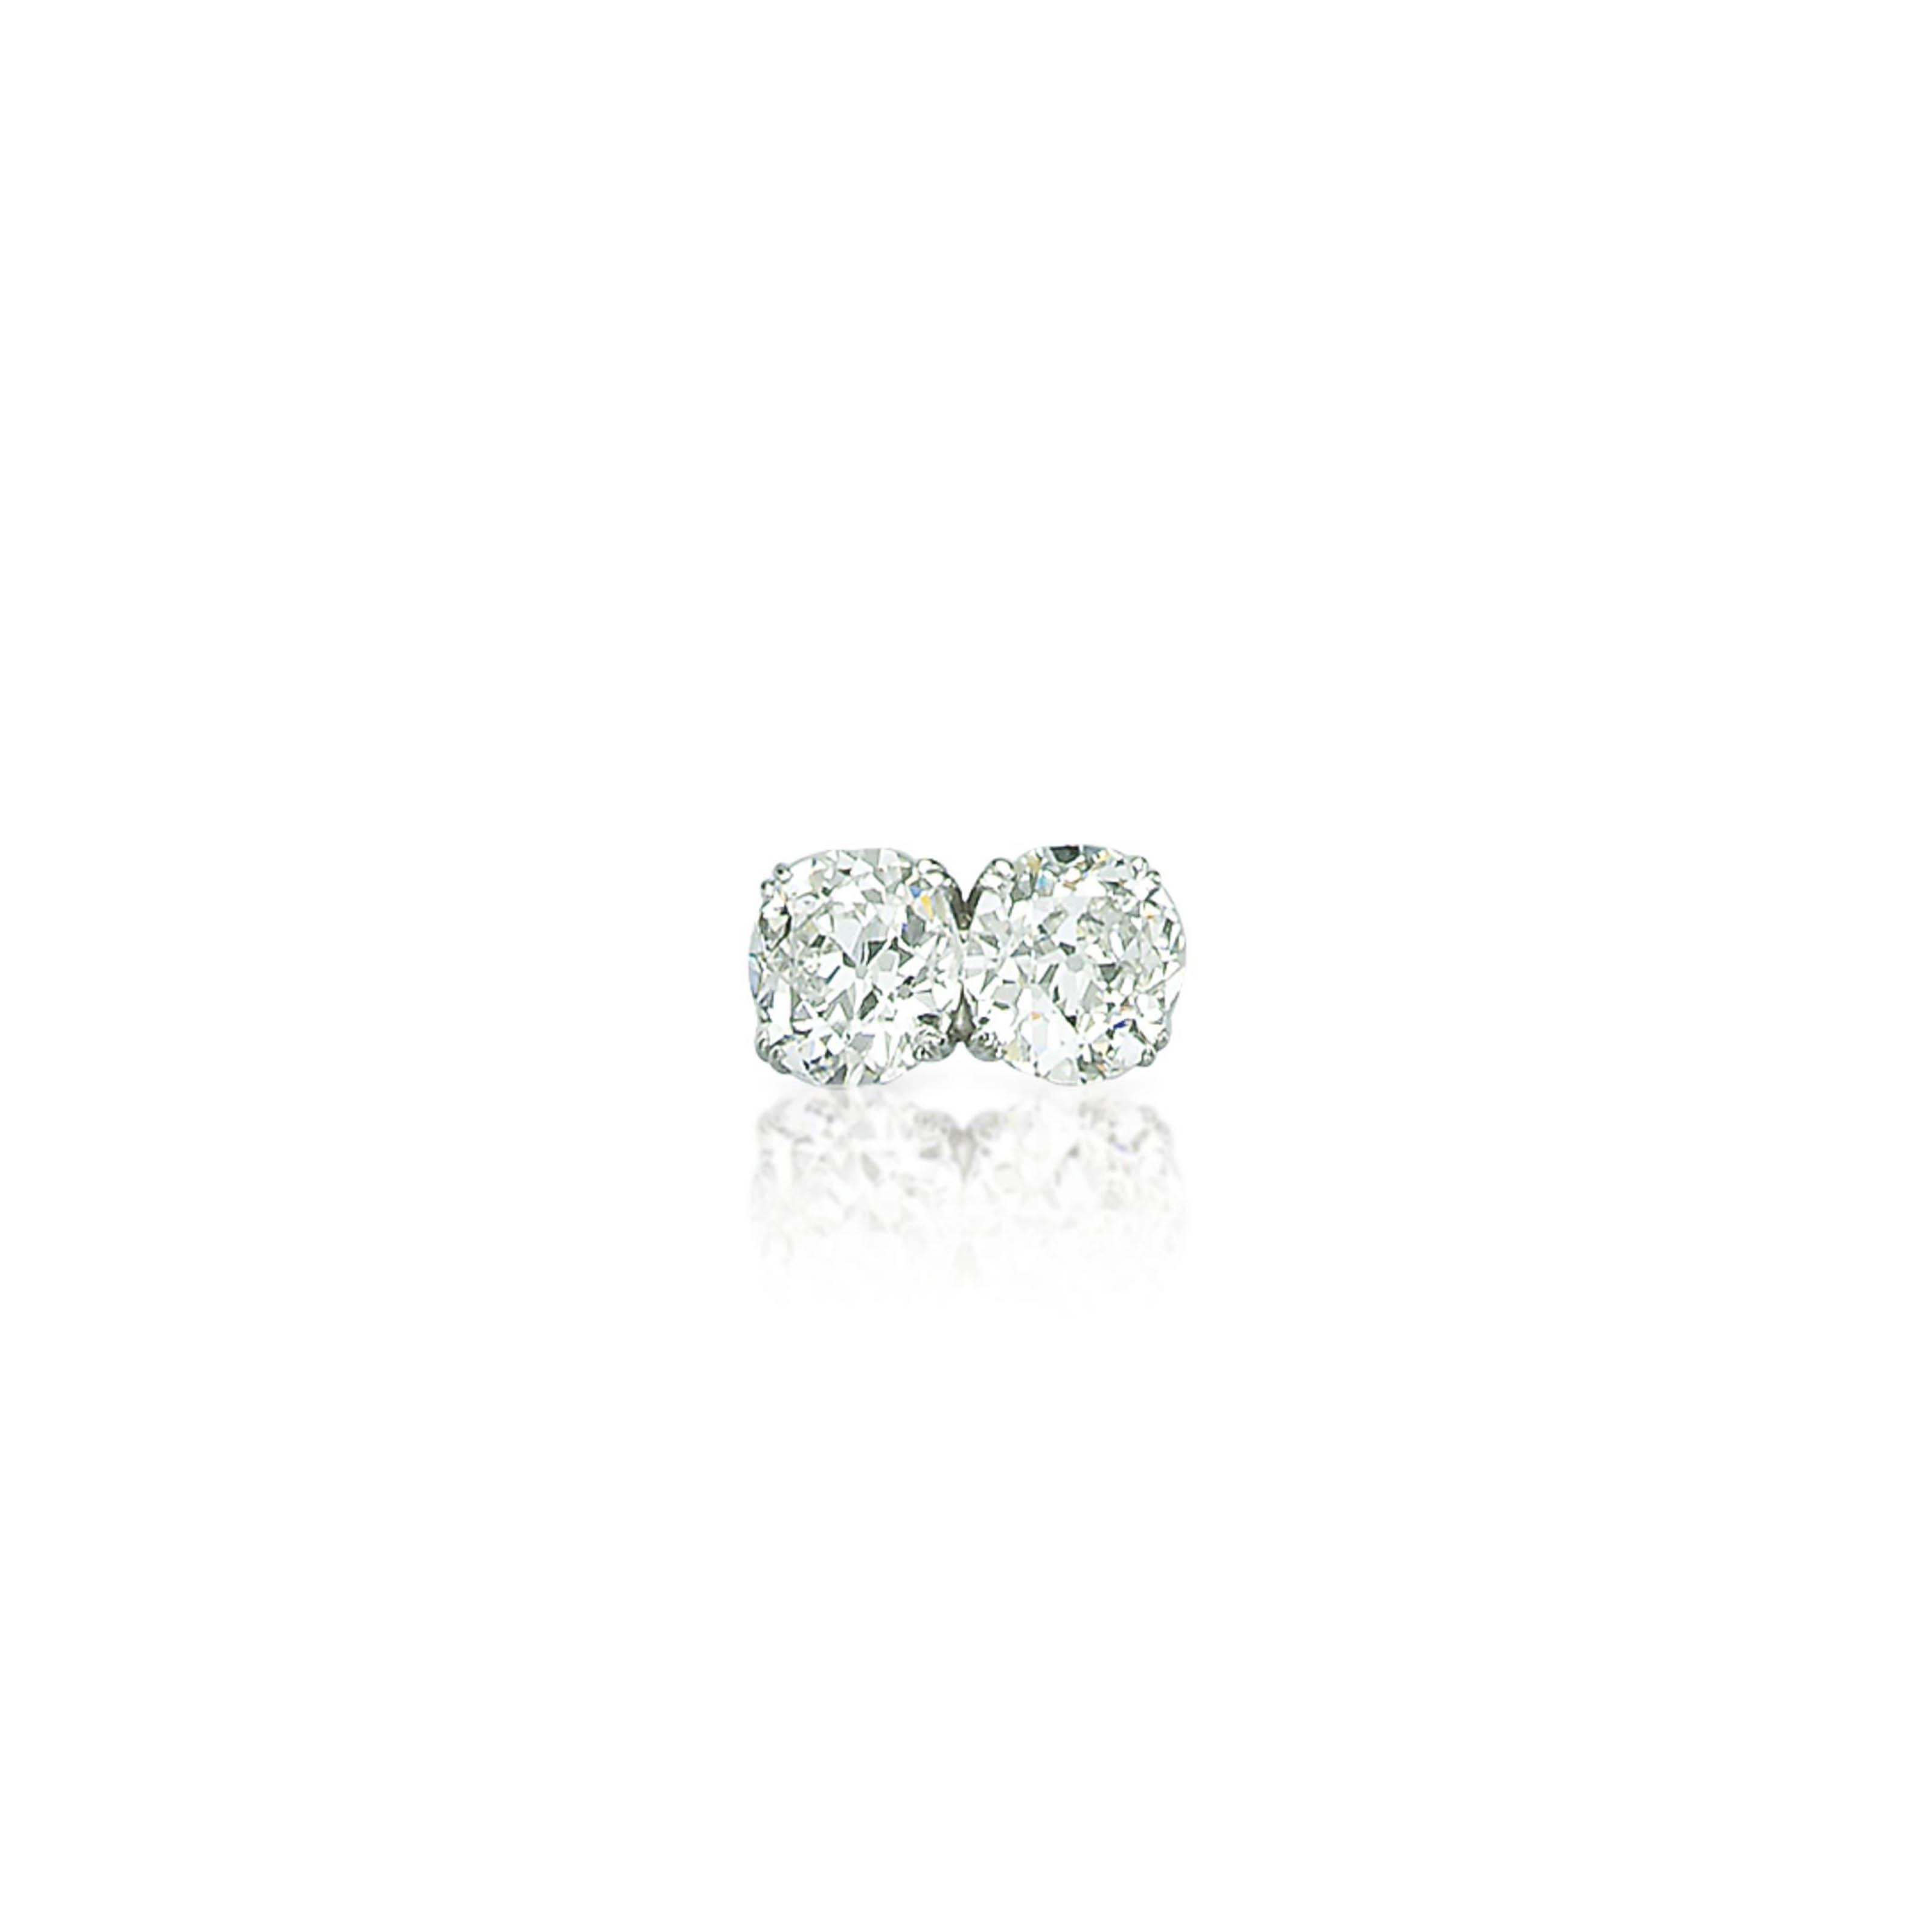 A DIAMOND 'TOI ET MOI' RING, BY GÜBELIN